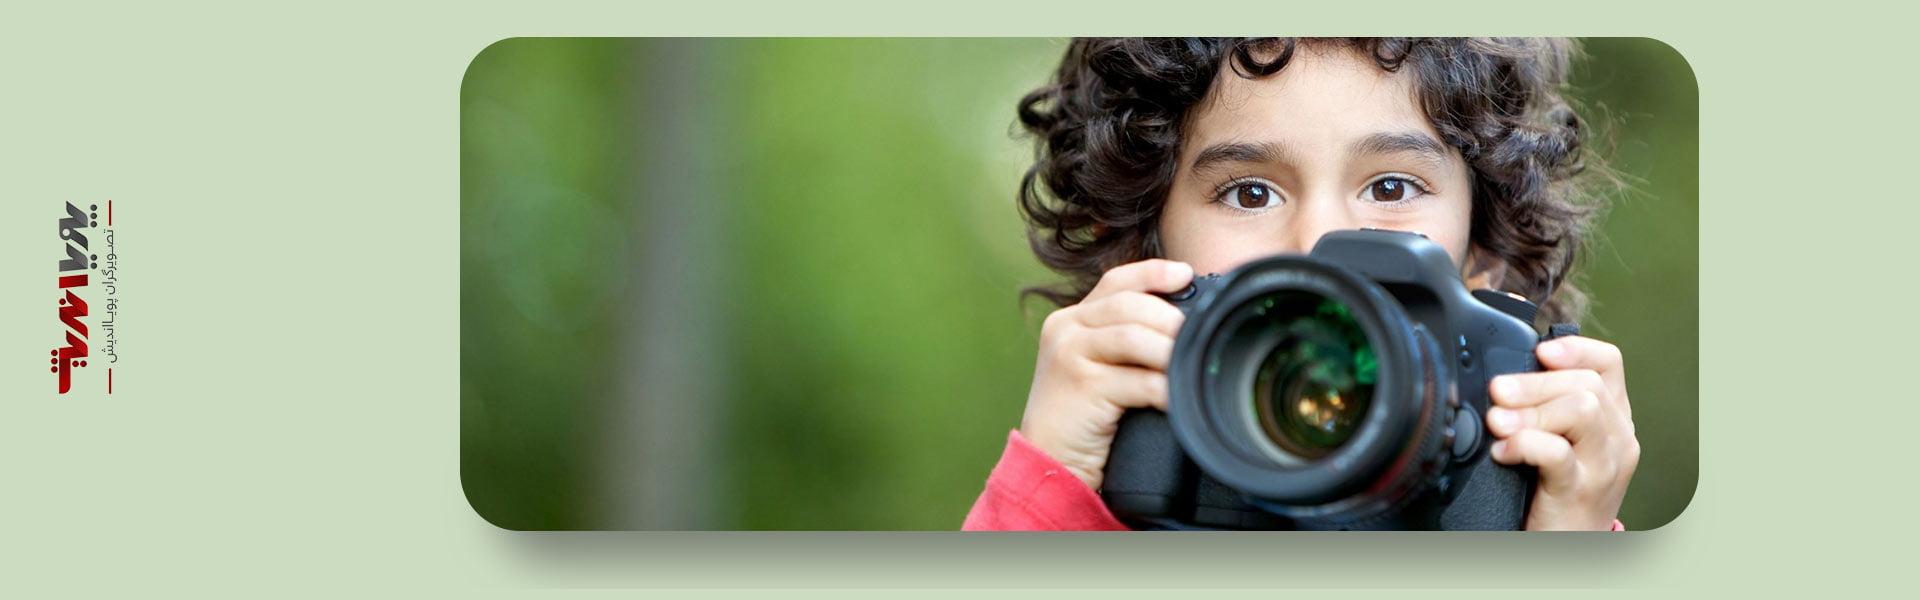 child photographer 2 - چرا کودکان ما باید عکاسی بیاموزند ؟